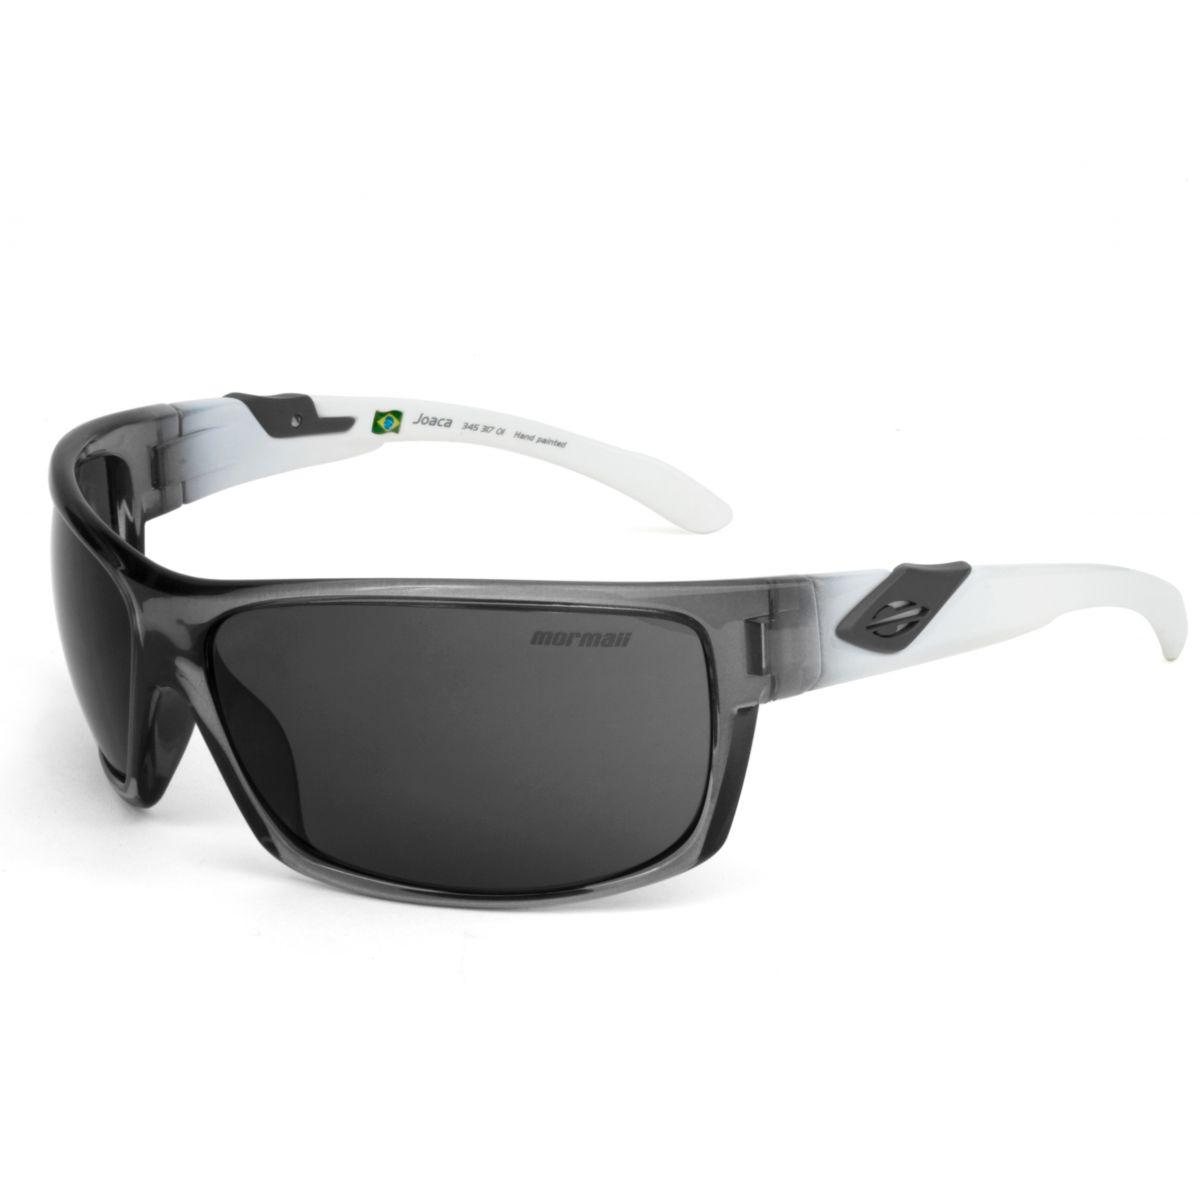 Óculos De Sol Masculino Joaca Mormaii 345 317 01MormaiiMormaii de ... 2fe94849c2